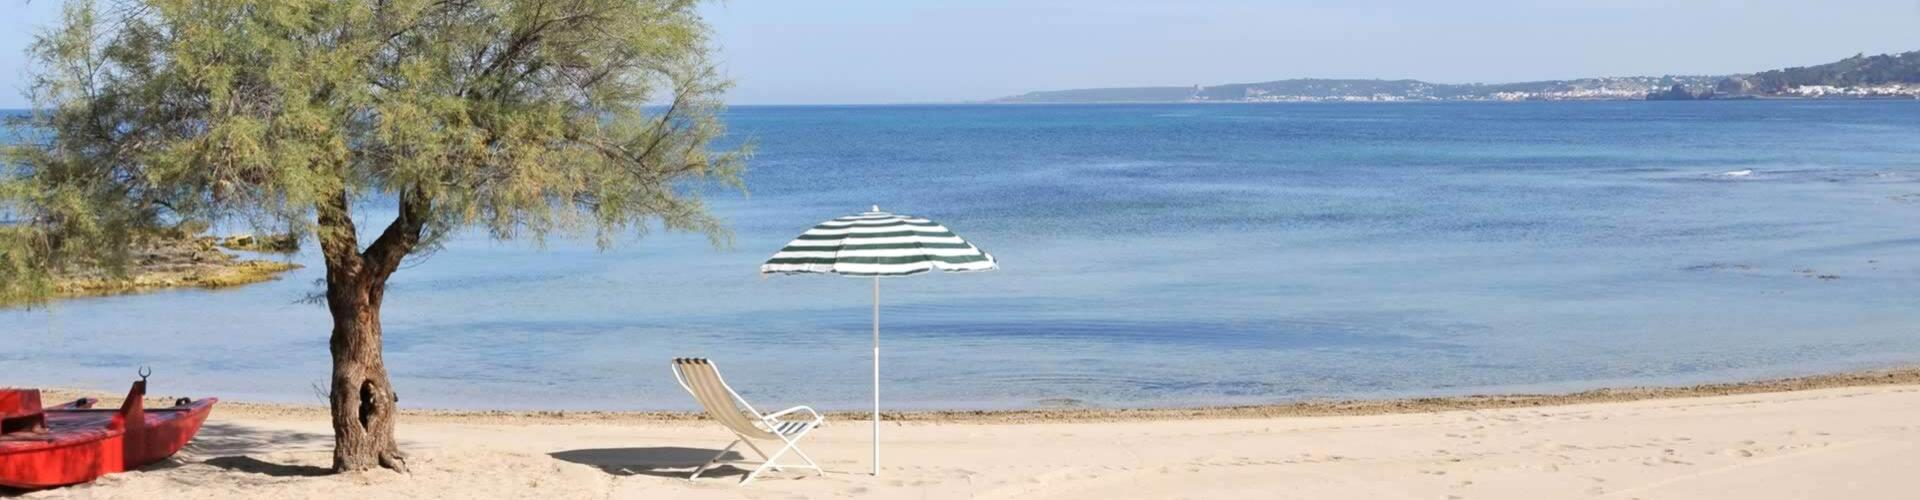 lavecchiatorregallipoli en a-holiday-for-everyone 008